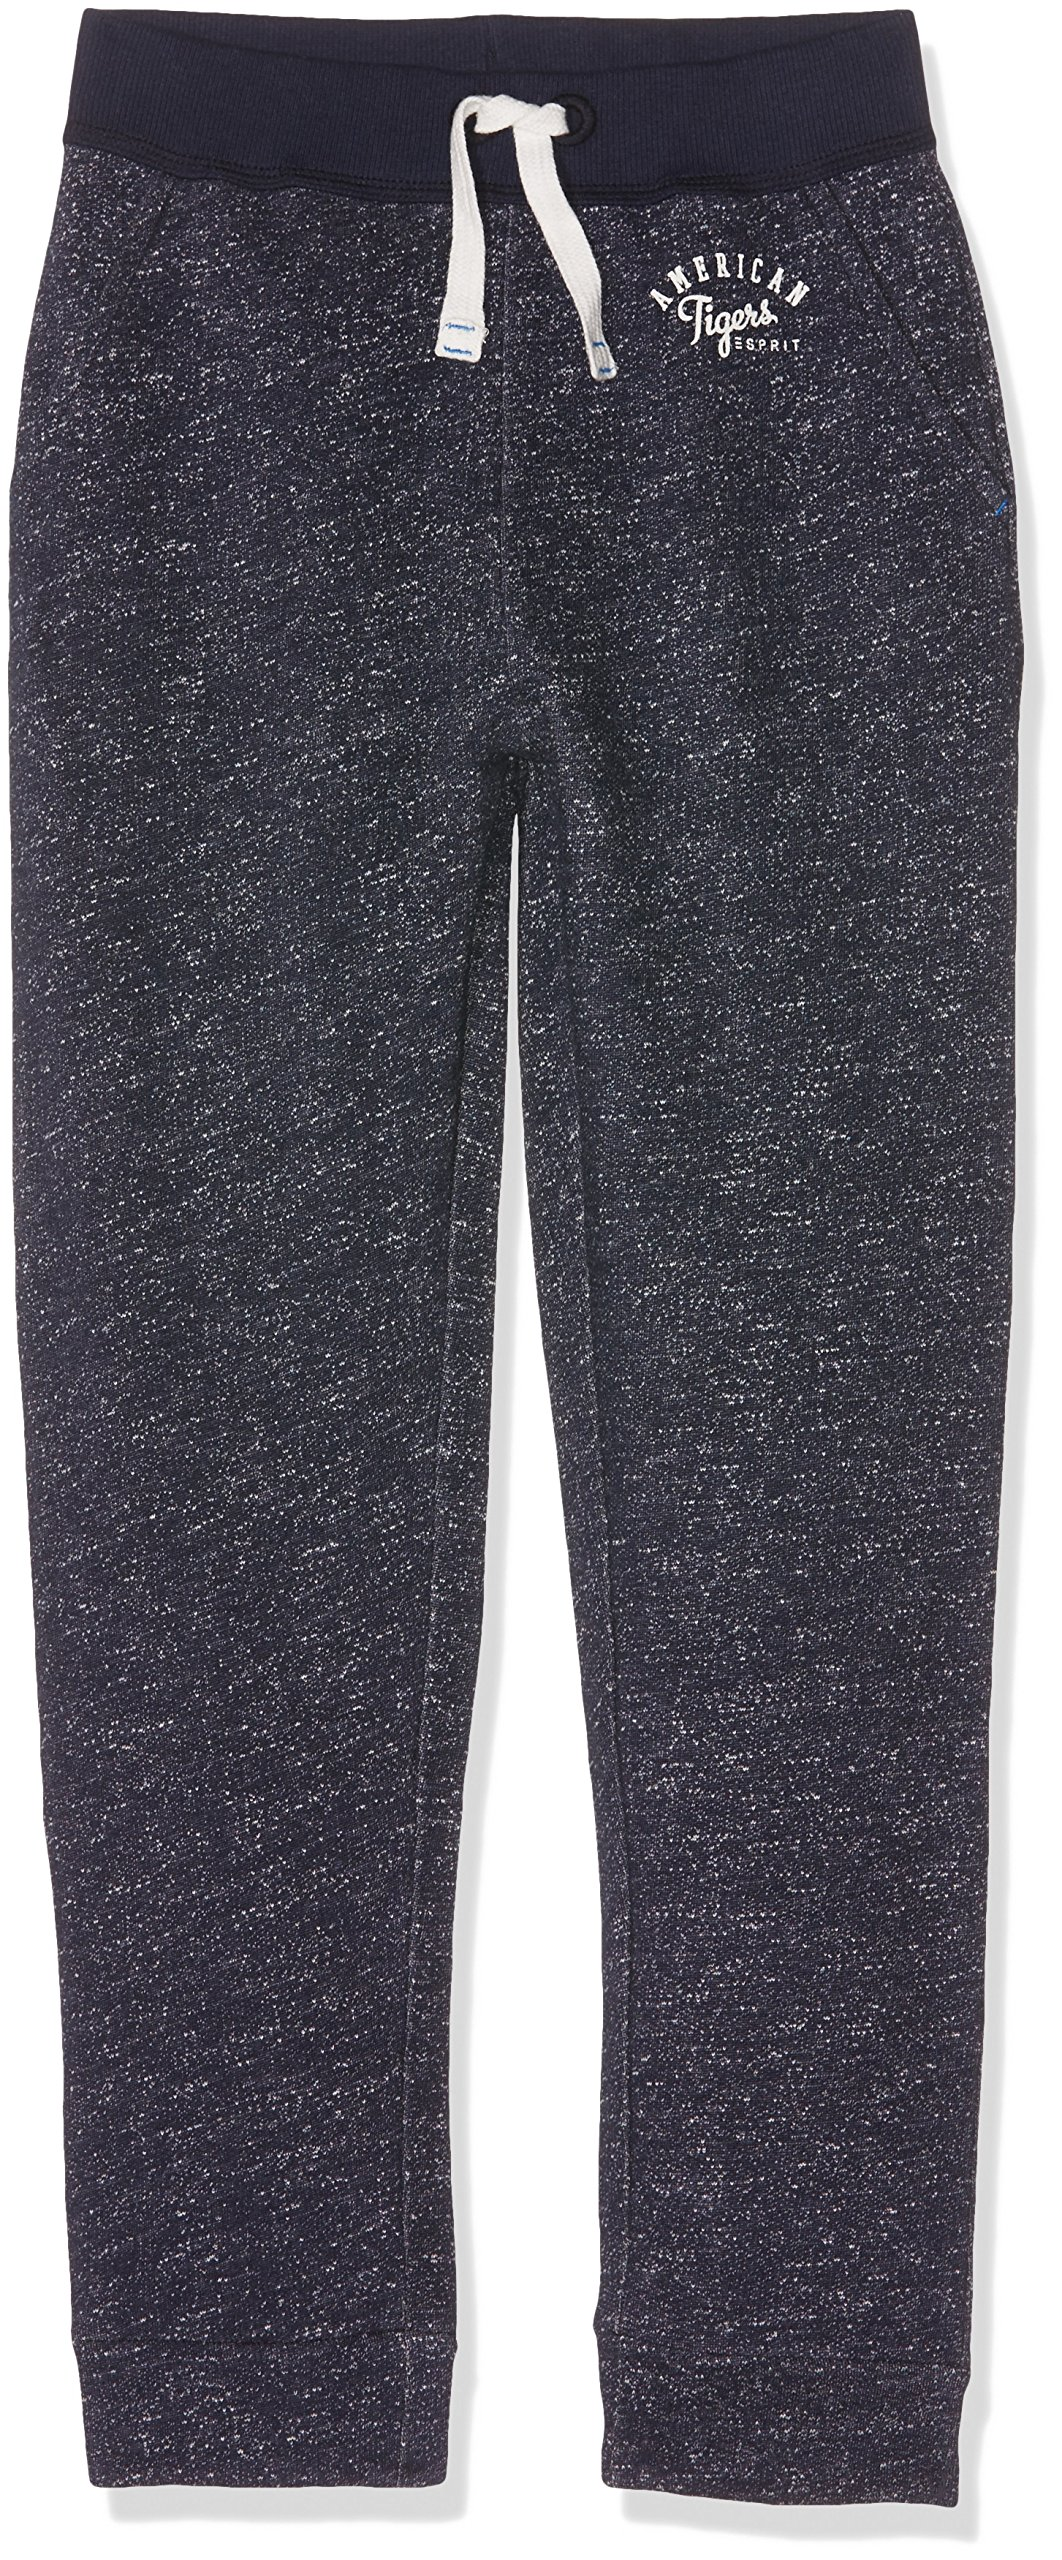 Esprit Hose Pantalones para Niñas